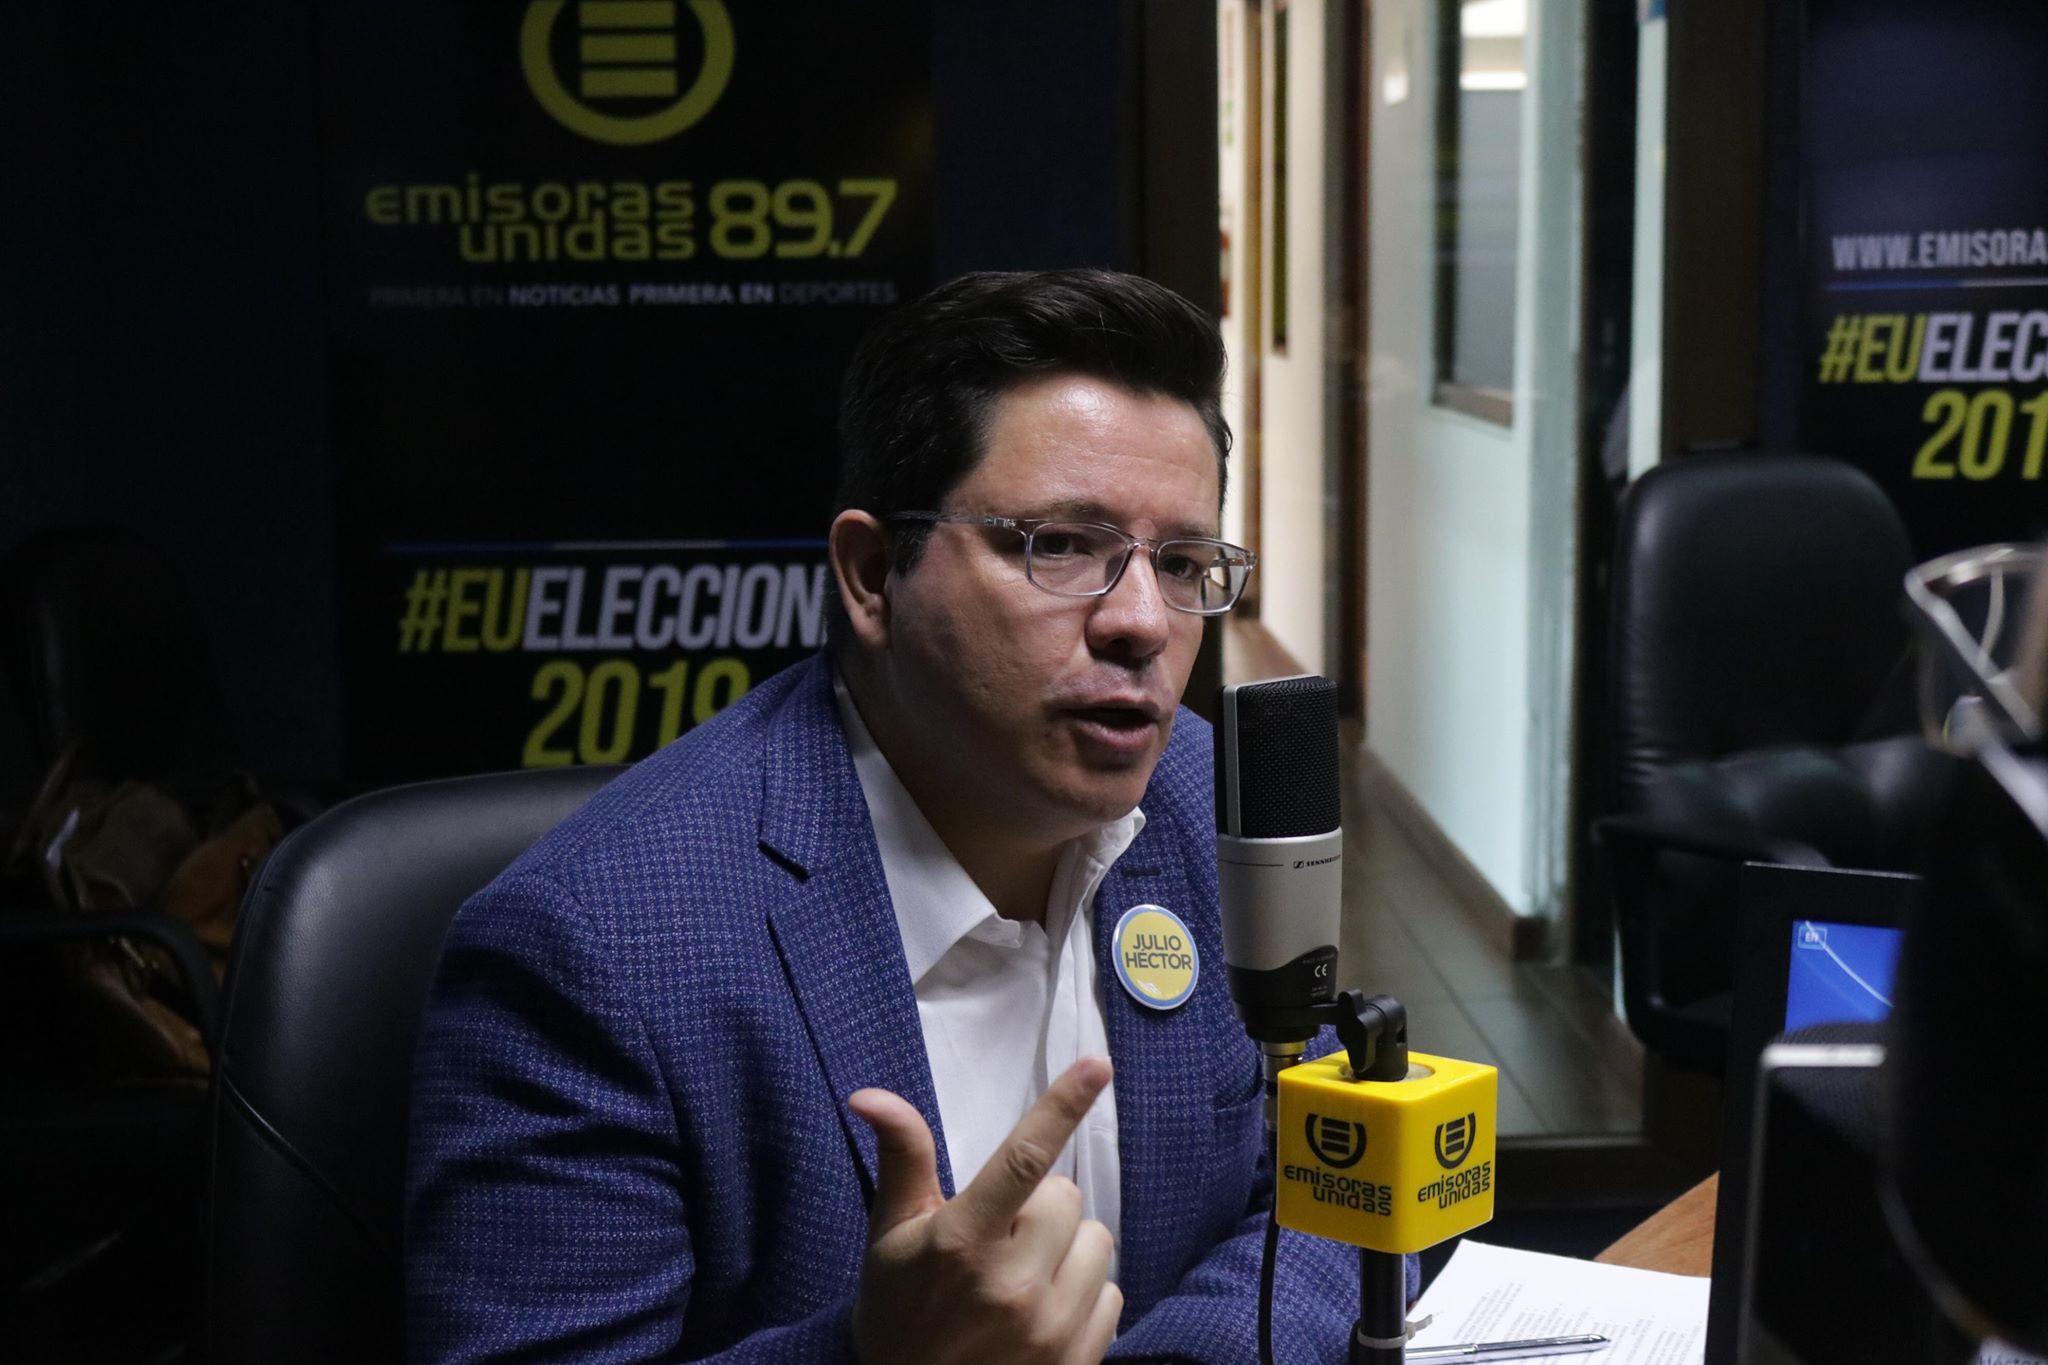 Julio Héctor Estrada